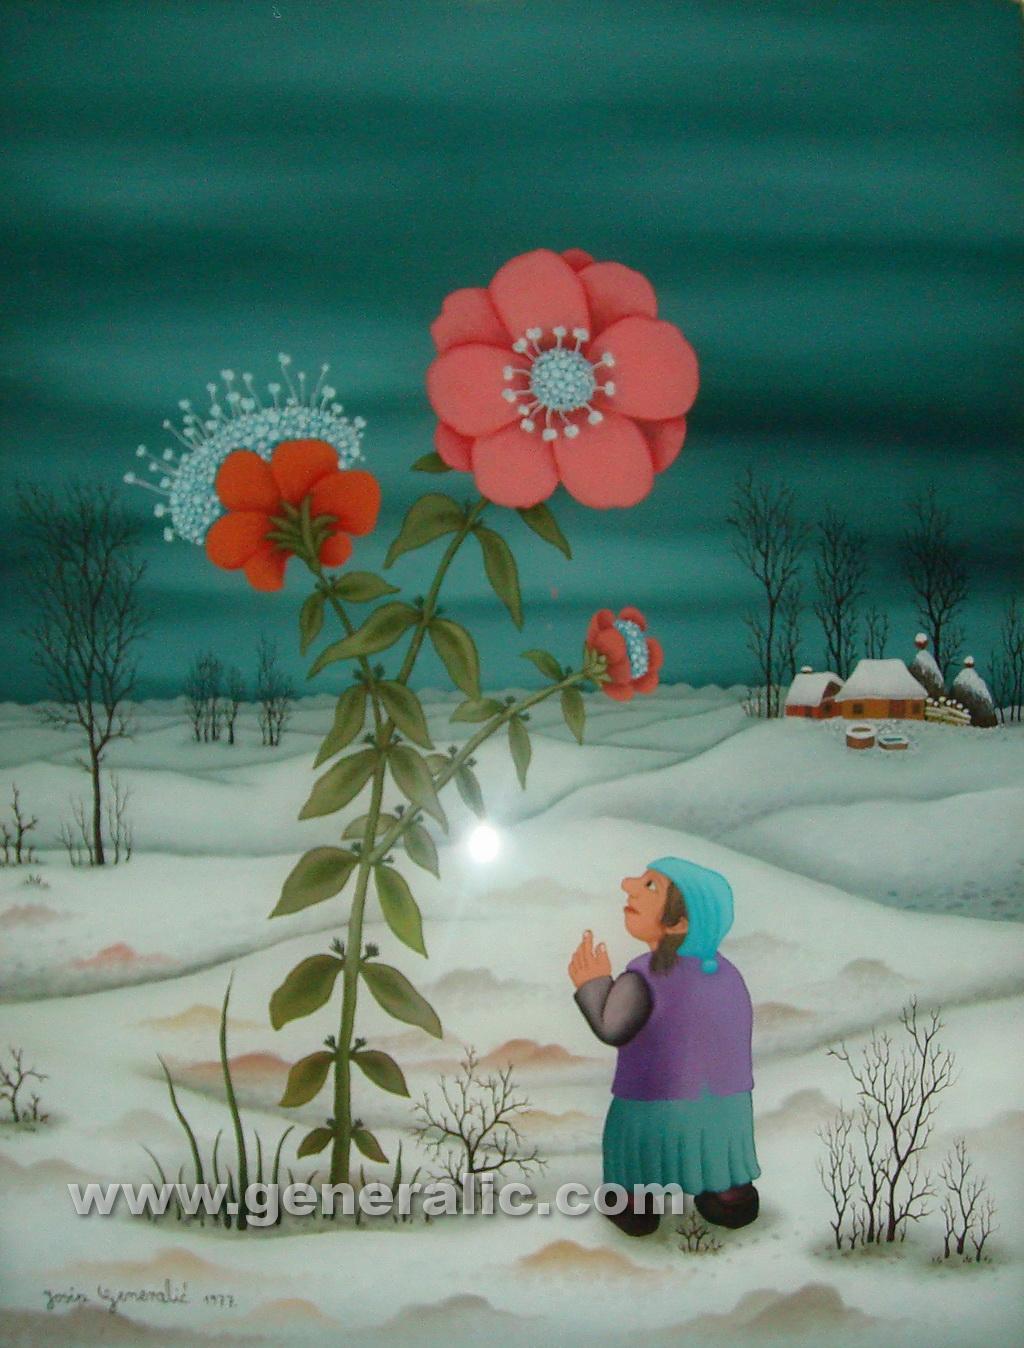 Josip Generalic, 1977, Girl with flower, oil on glass